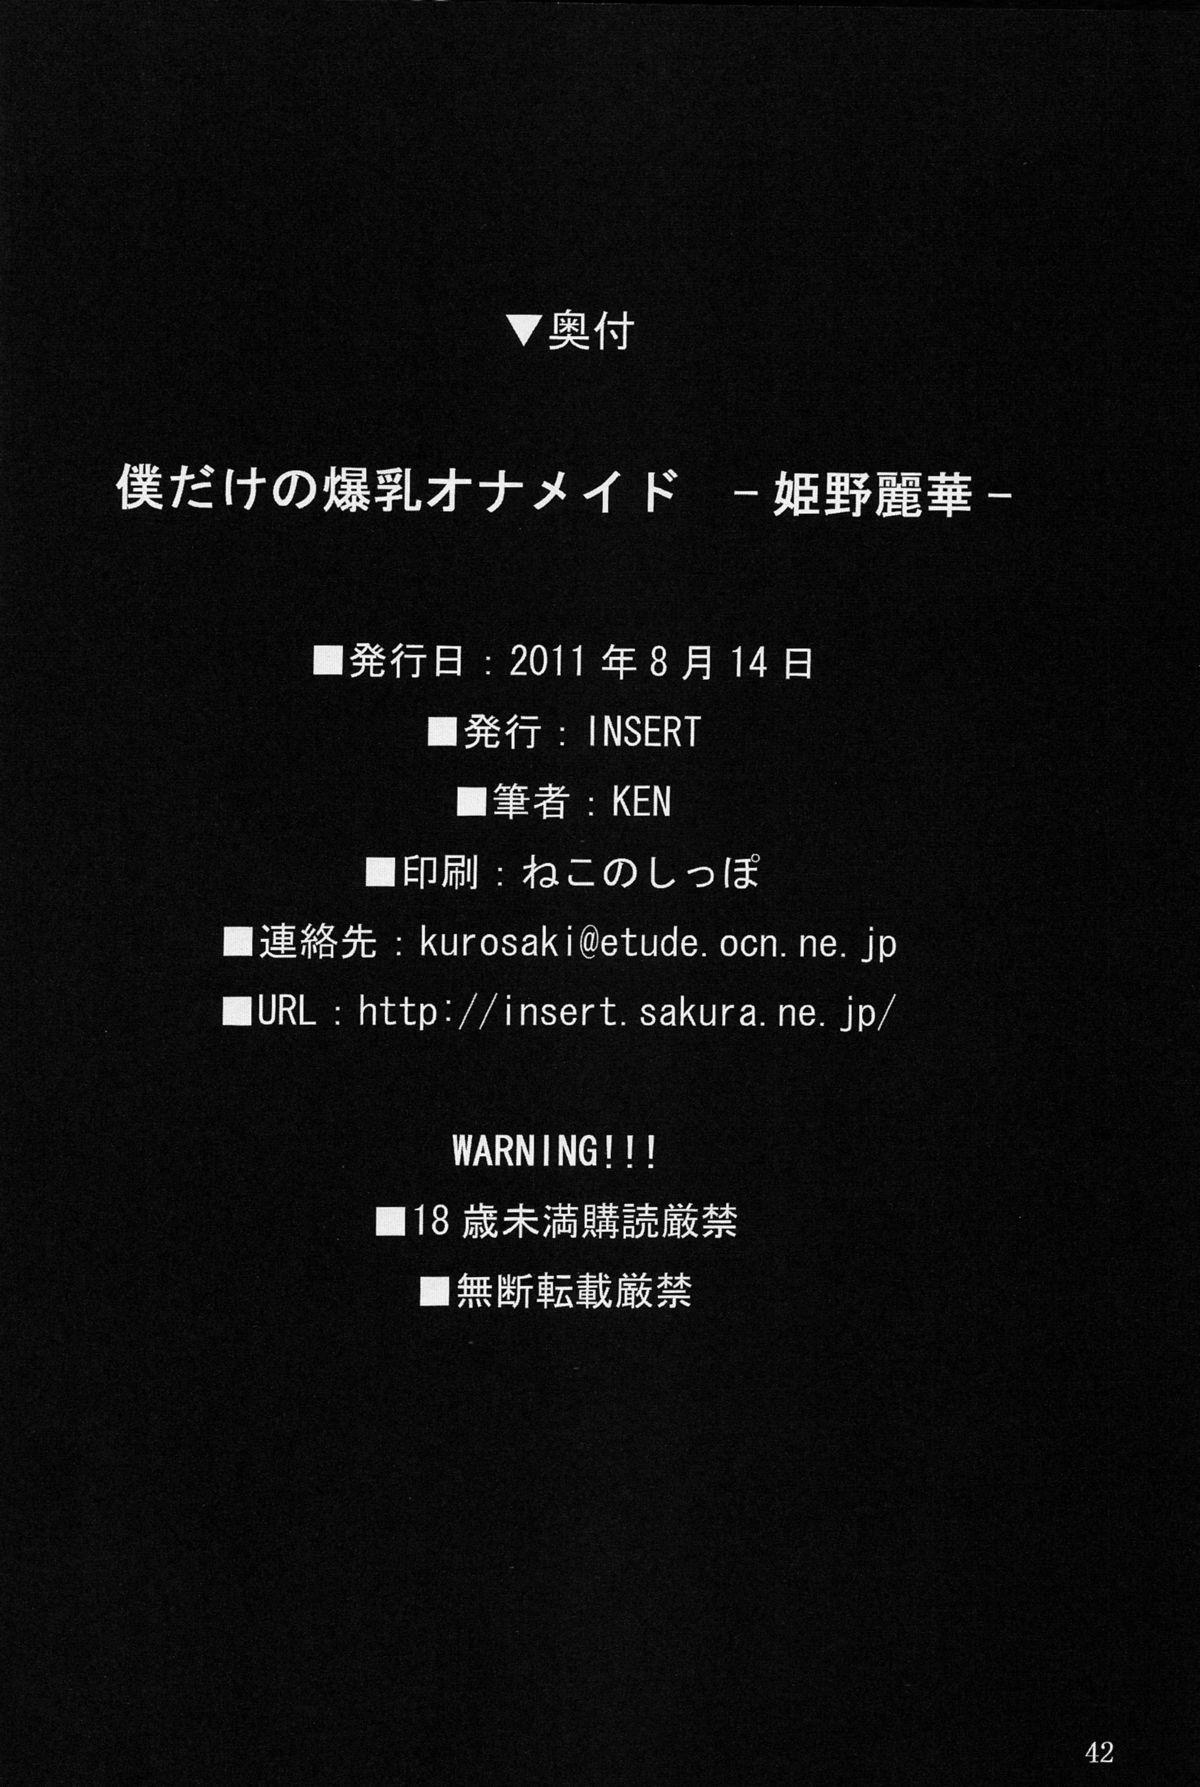 (C80) [INSERT (KEN)] Boku Dake no Bakunyuu Ona-maid -Himeno Reika hen-   My Personal Big Breasted Masturbation Maid - Himeno Reika Arc- [English] [doujin-moe.us] 41